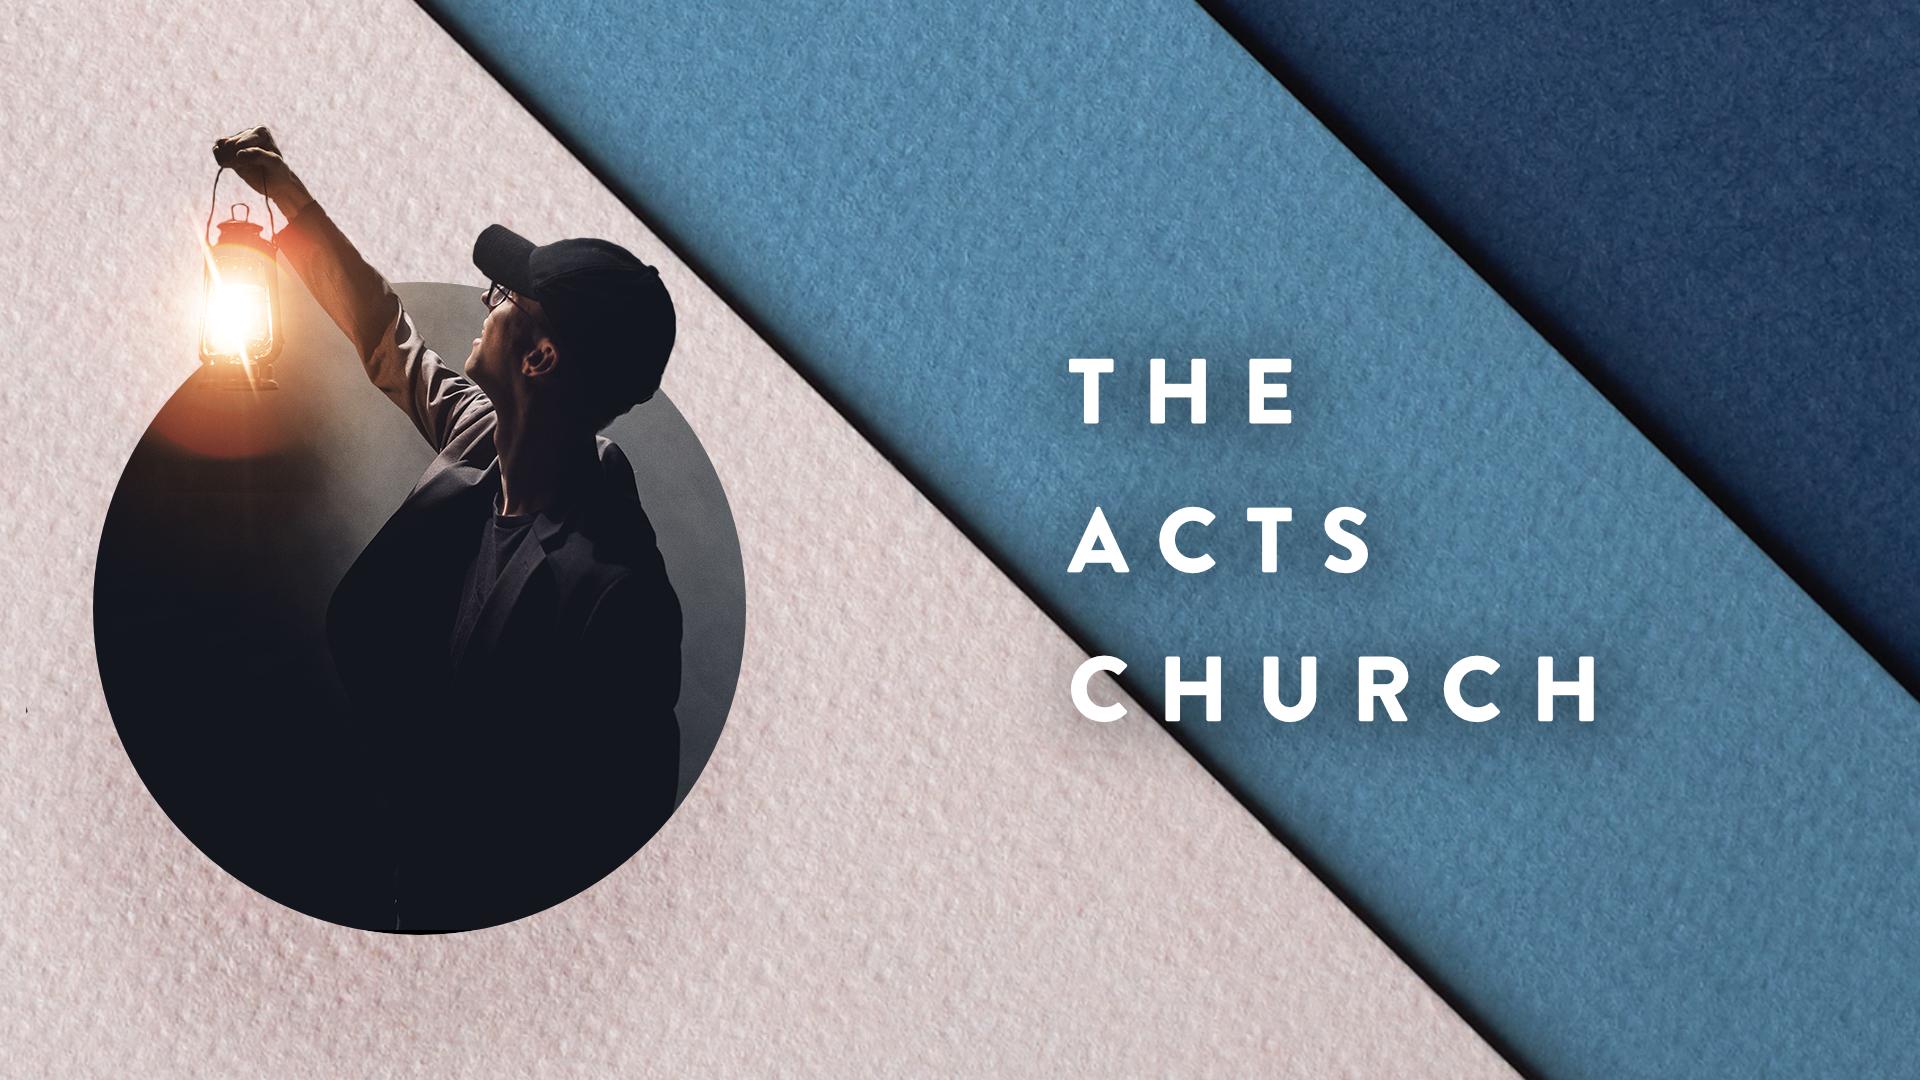 The Acts Church 16-9.jpg